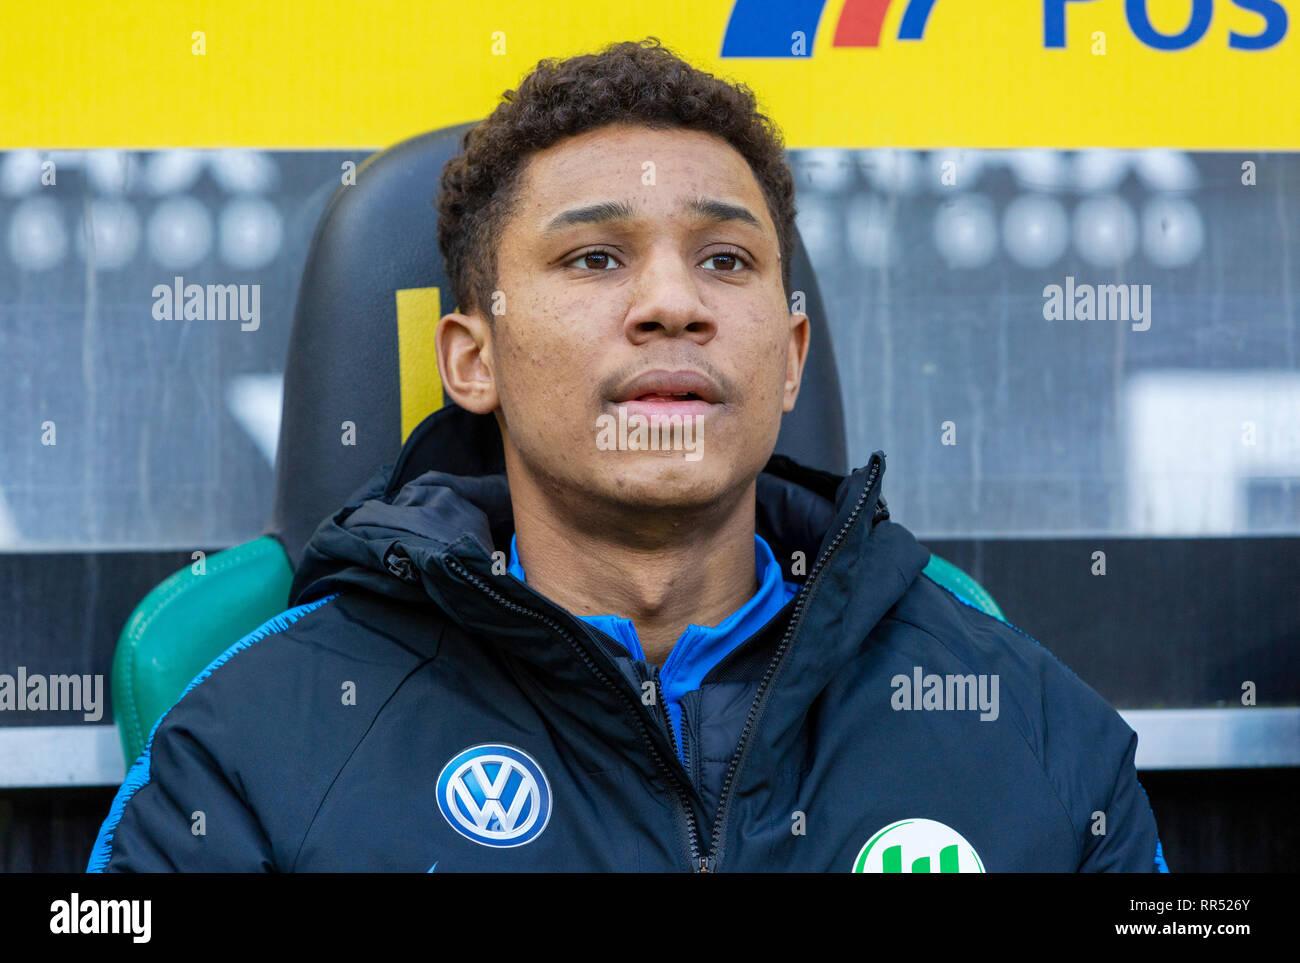 sports, football, Bundesliga, 2018/2019, Borussia Moenchengladbach vs VfL Wolfsburg 0-3, Stadium Borussia Park, players bench, Ohis Felix Udookhai (Wolfsburg), DFL REGULATIONS PROHIBIT ANY USE OF PHOTOGRAPHS AS IMAGE SEQUENCES AND/OR QUASI-VIDEO - Stock Image